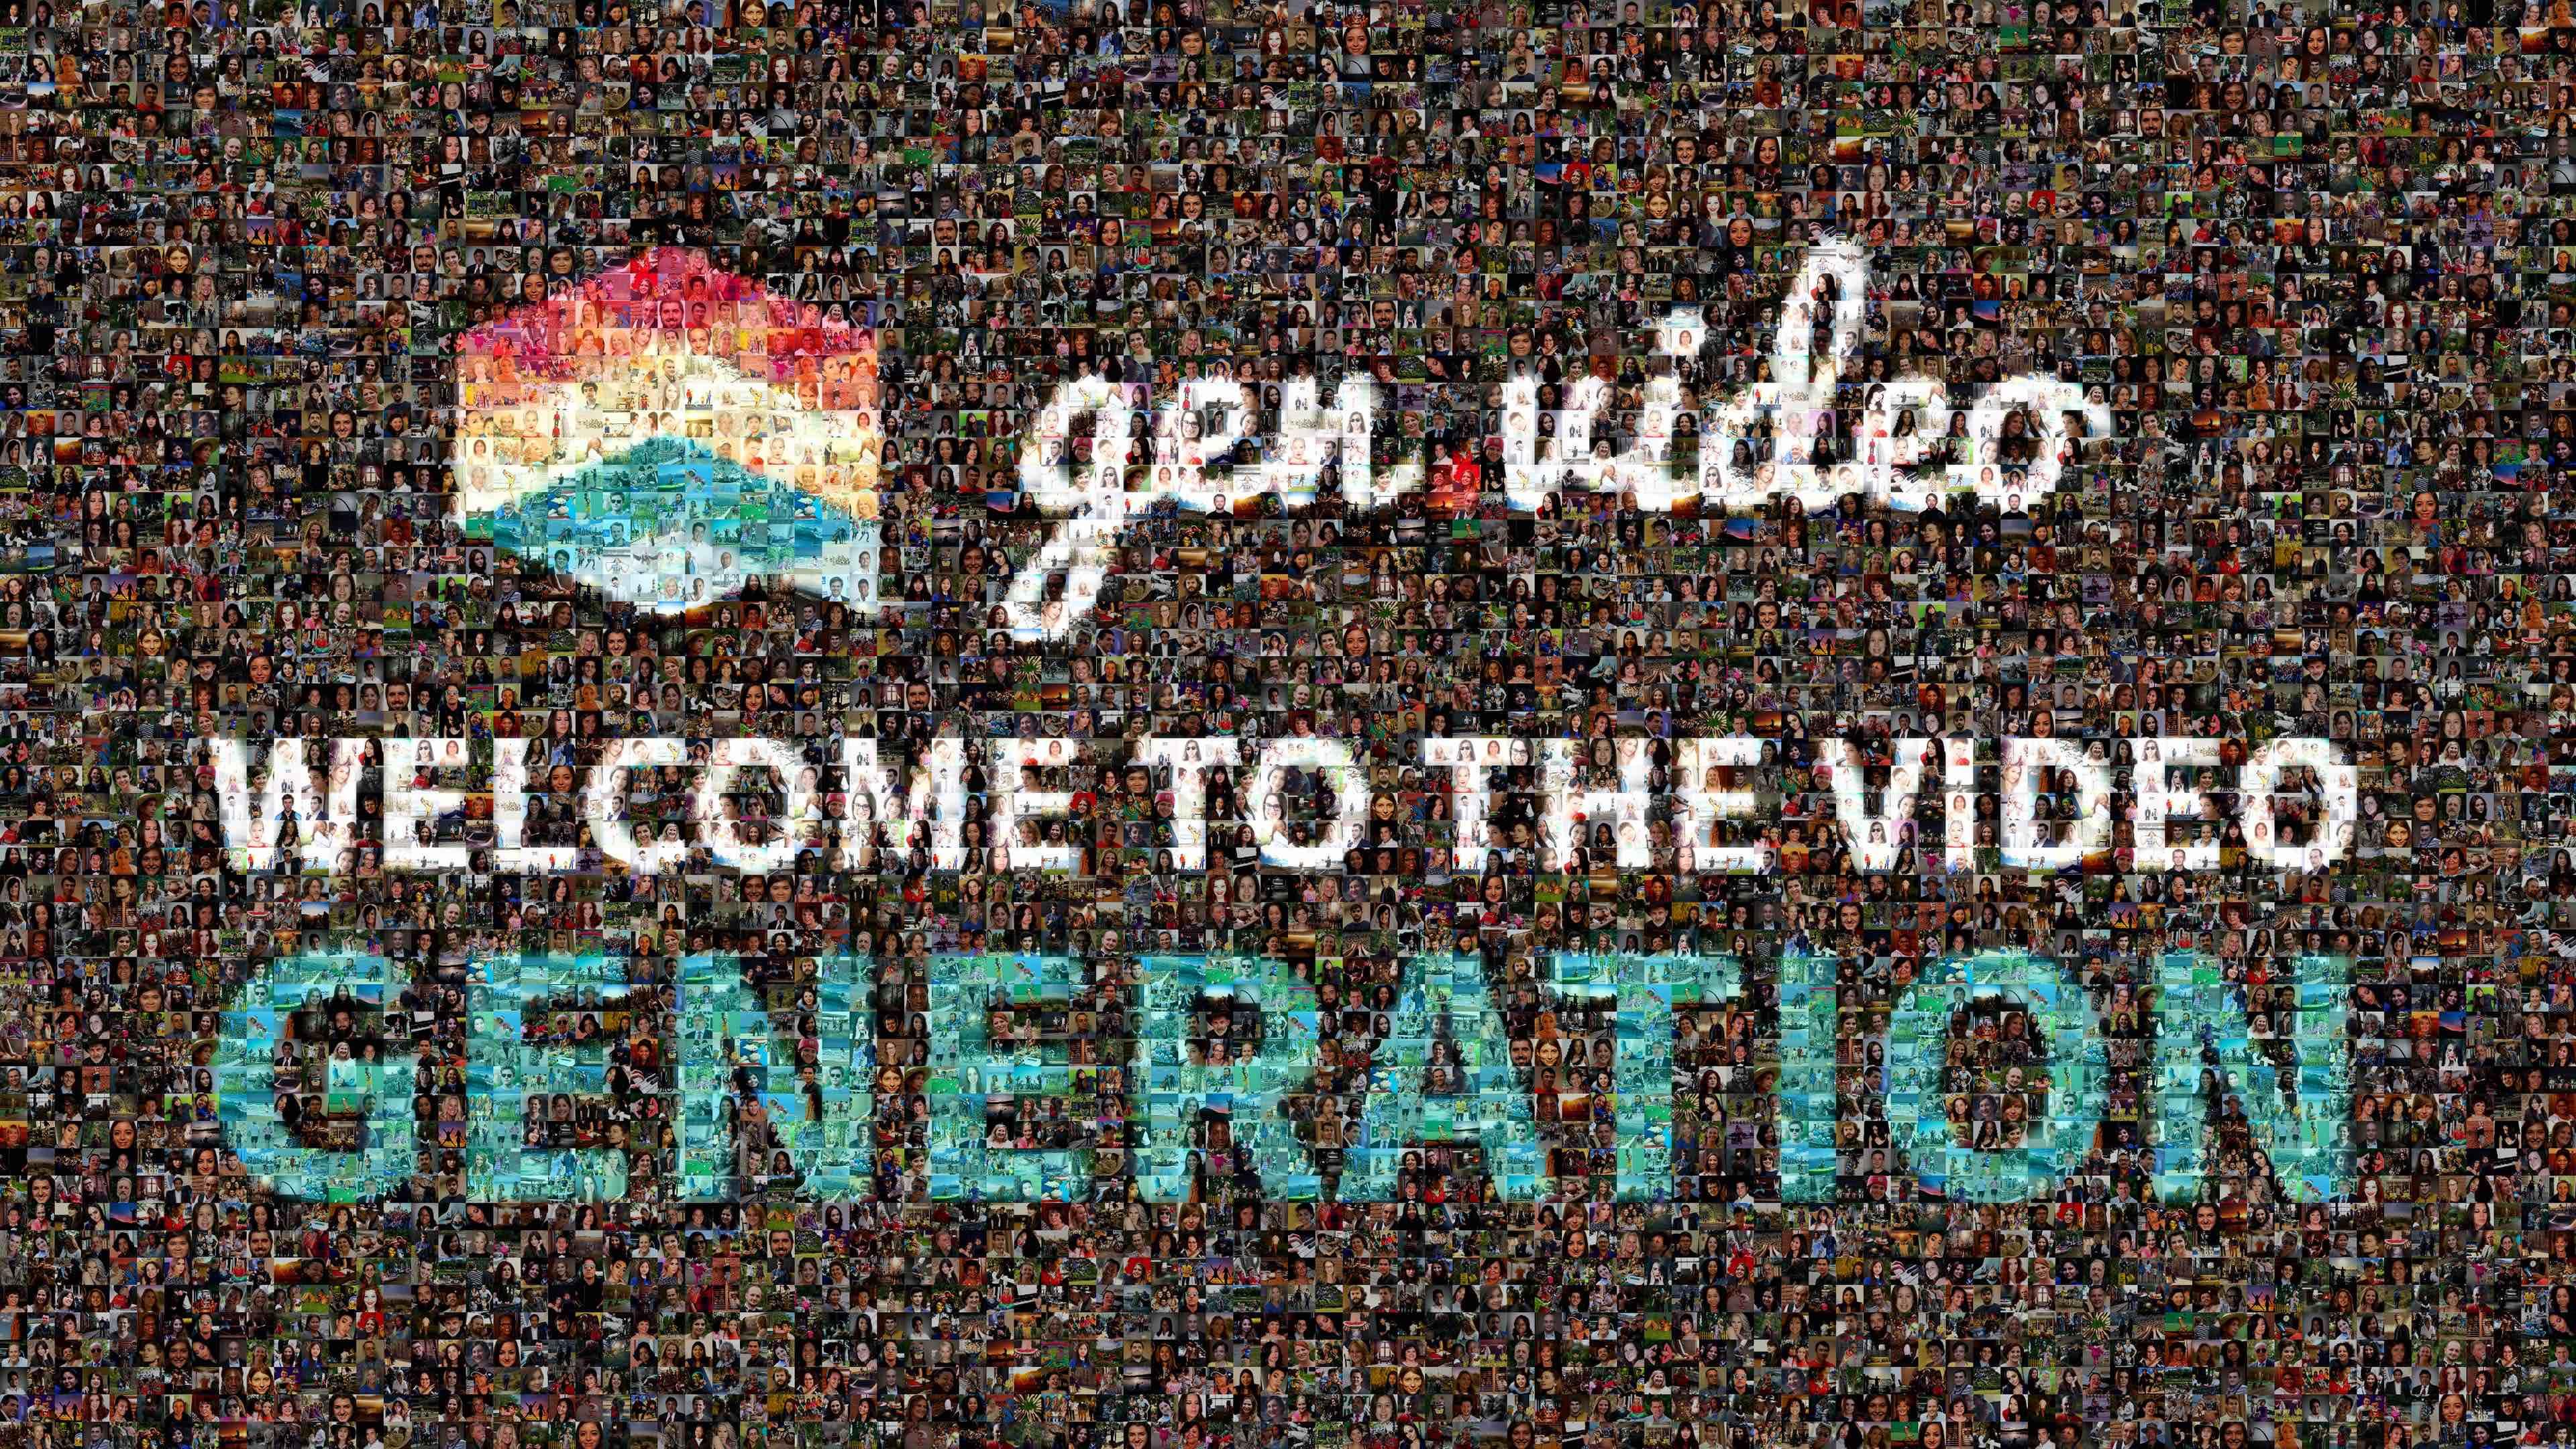 VIDCON, CELEBRATING THE VIDEO GENERATION